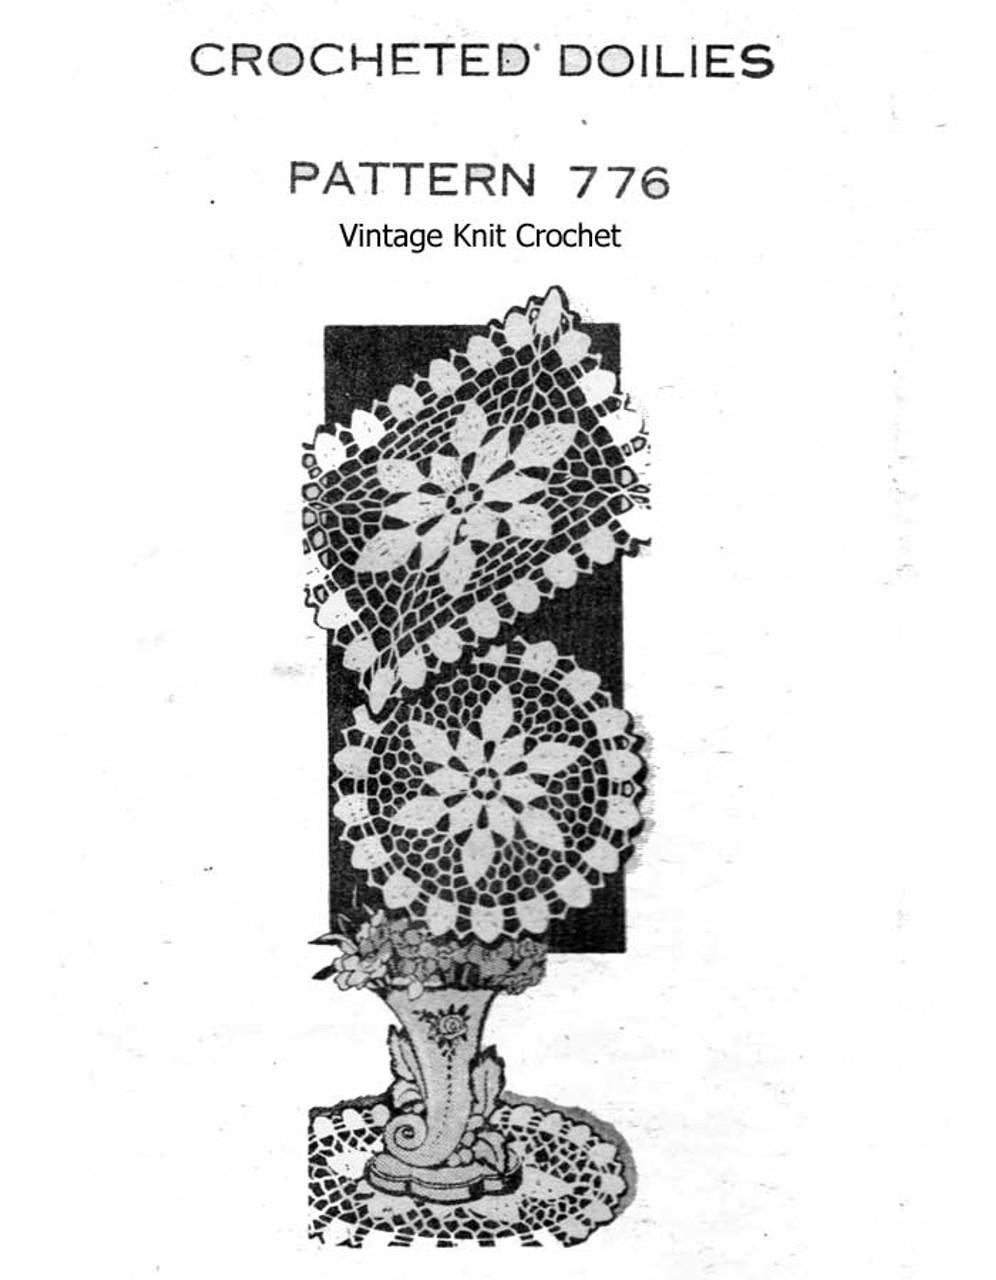 Crochet Doilies Pattern Round Square Design 776